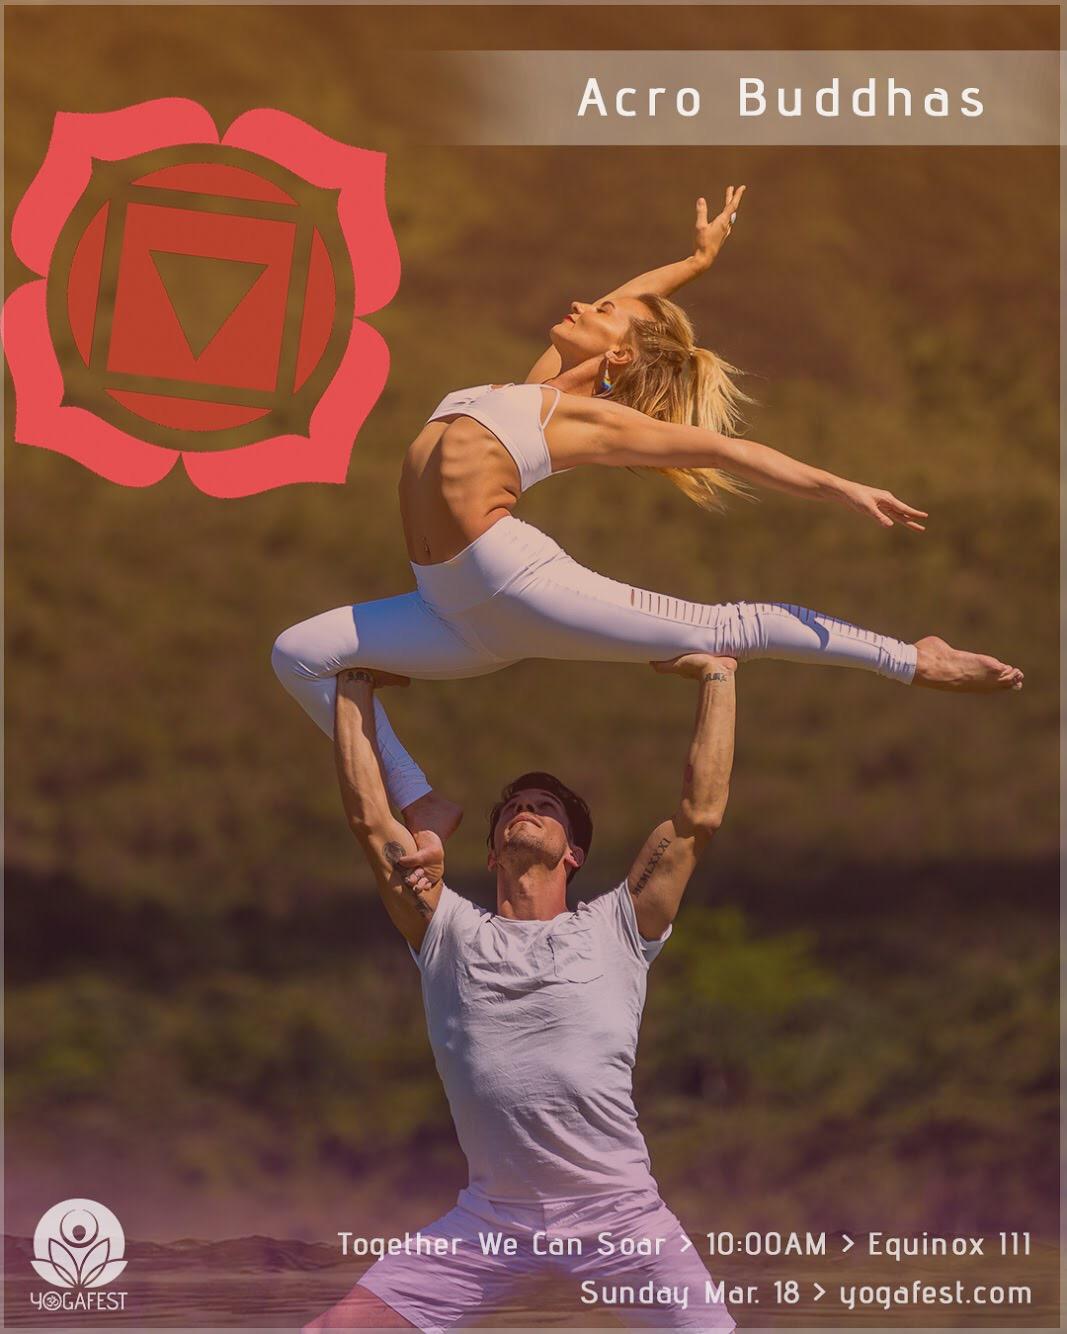 acro-buddhas-yogafest.JPG